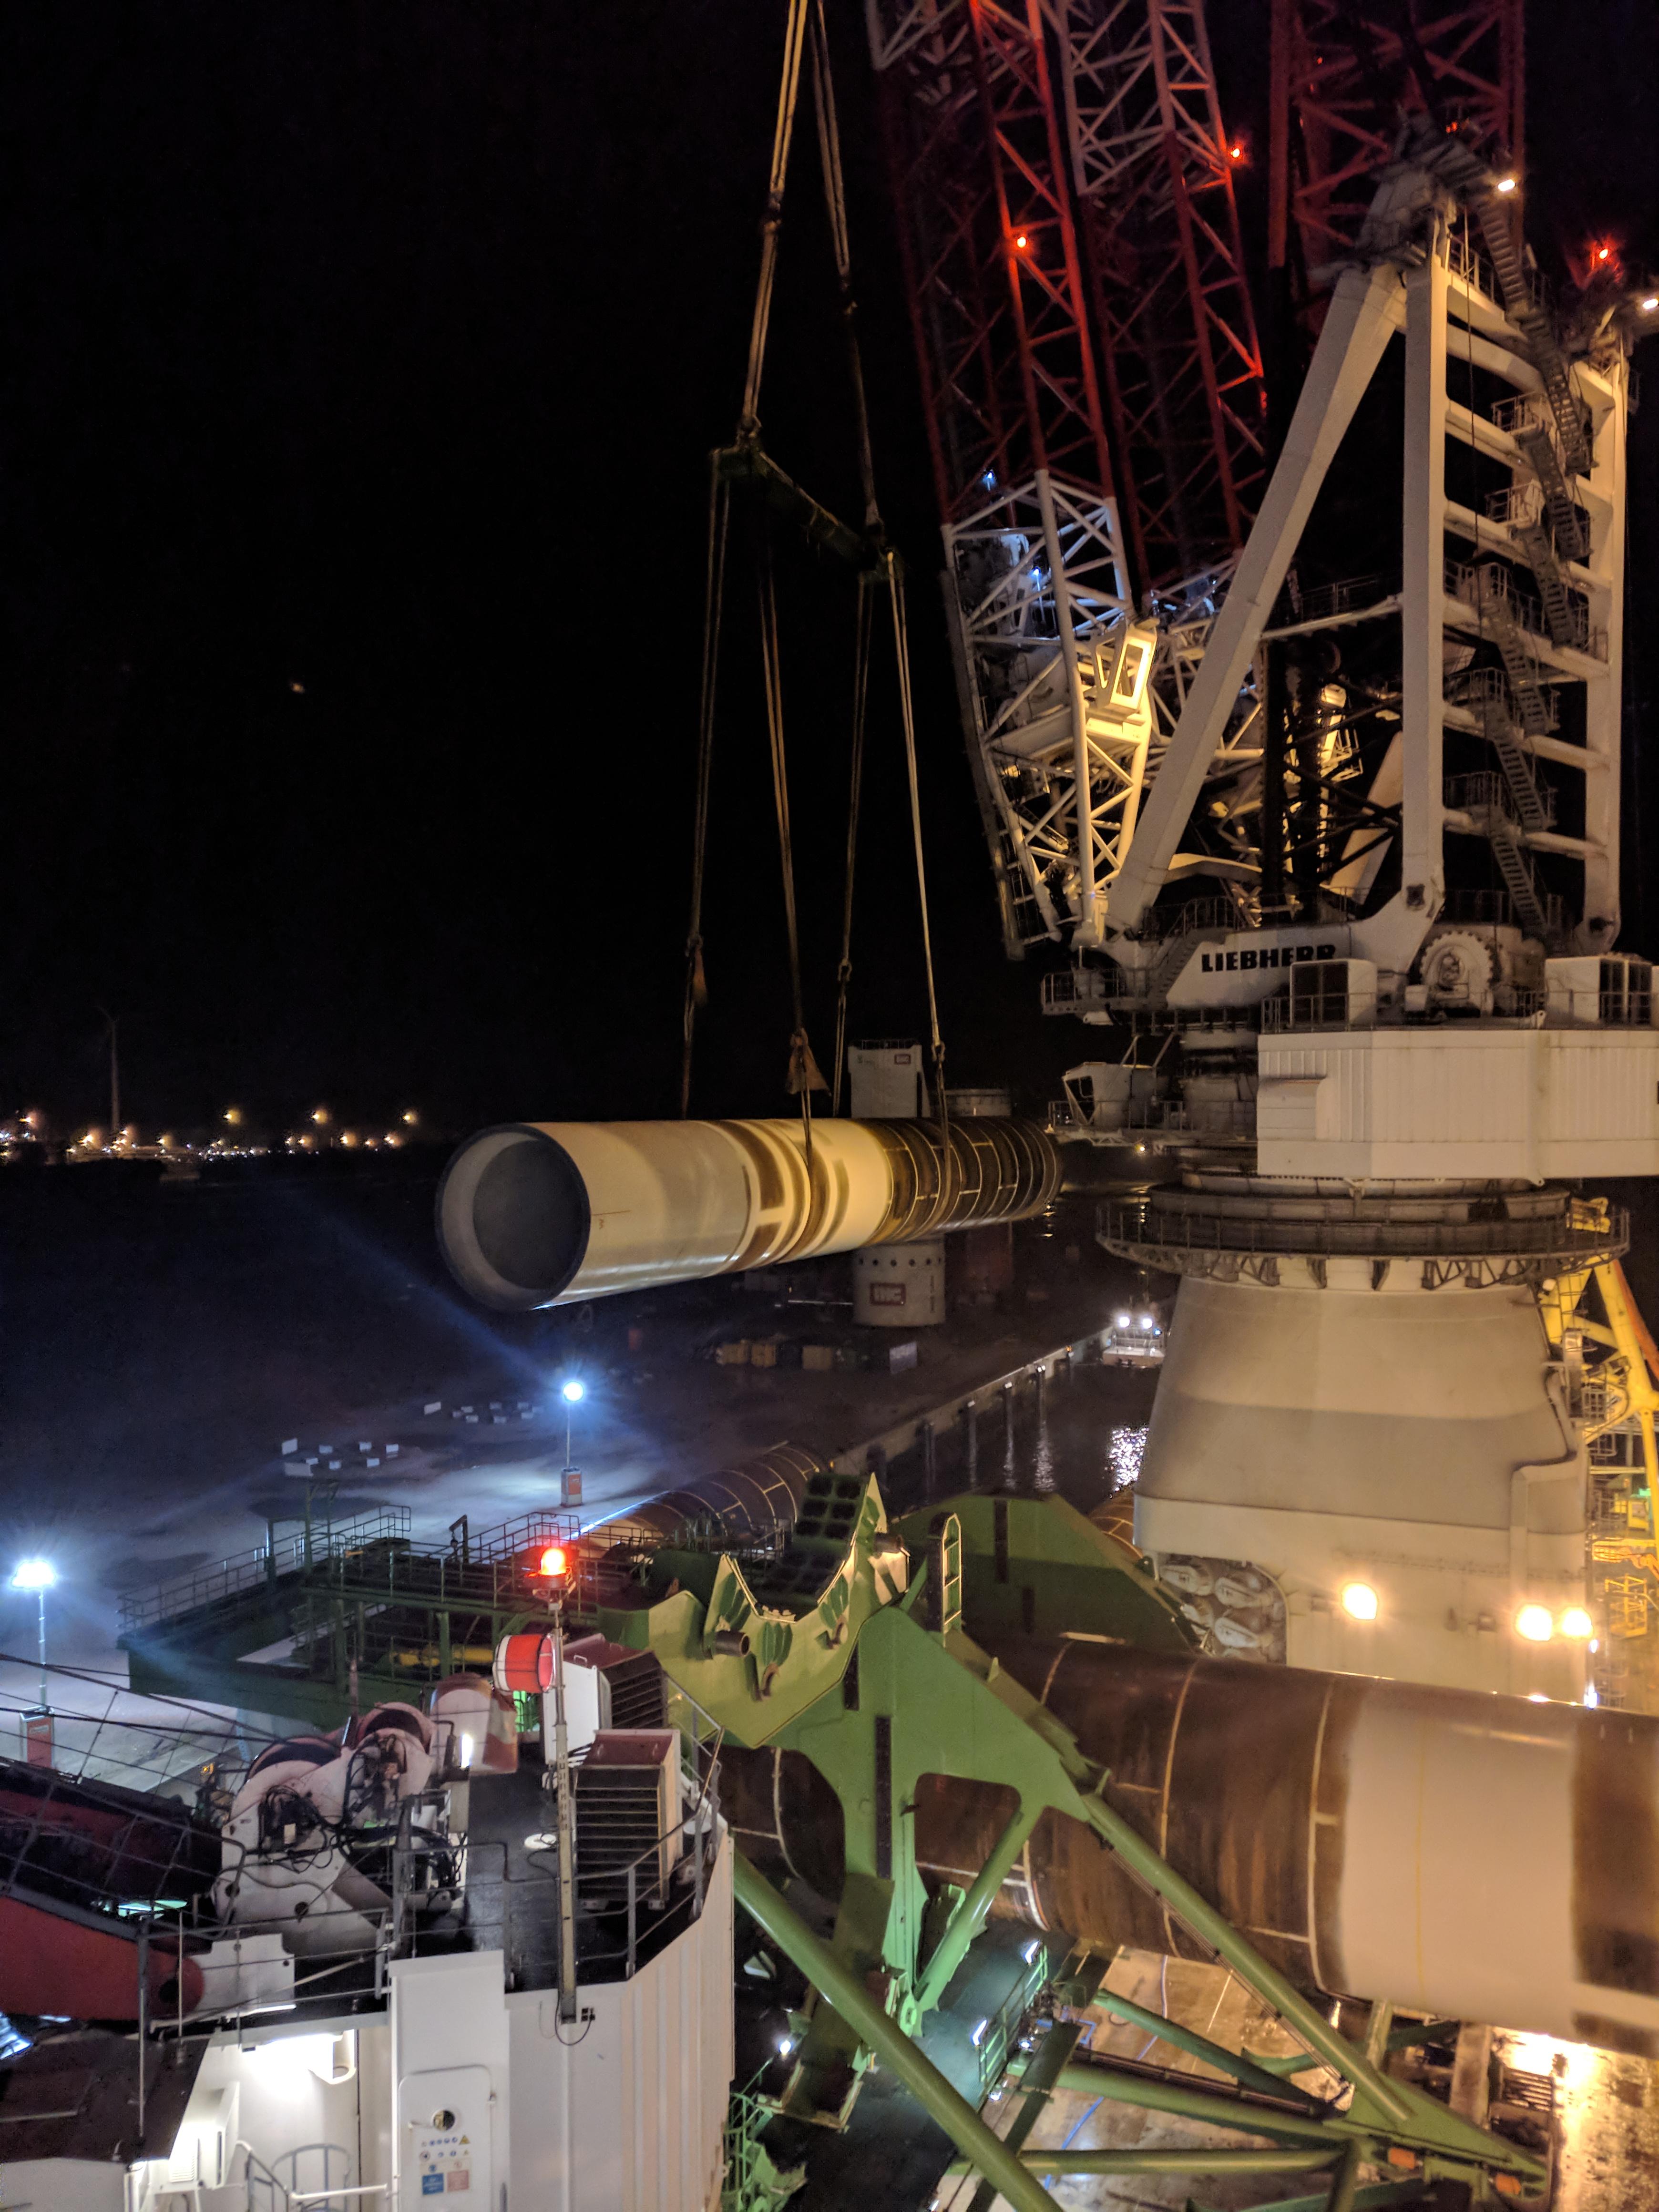 Monopile lastas på Innovation i Esbjerg hamn